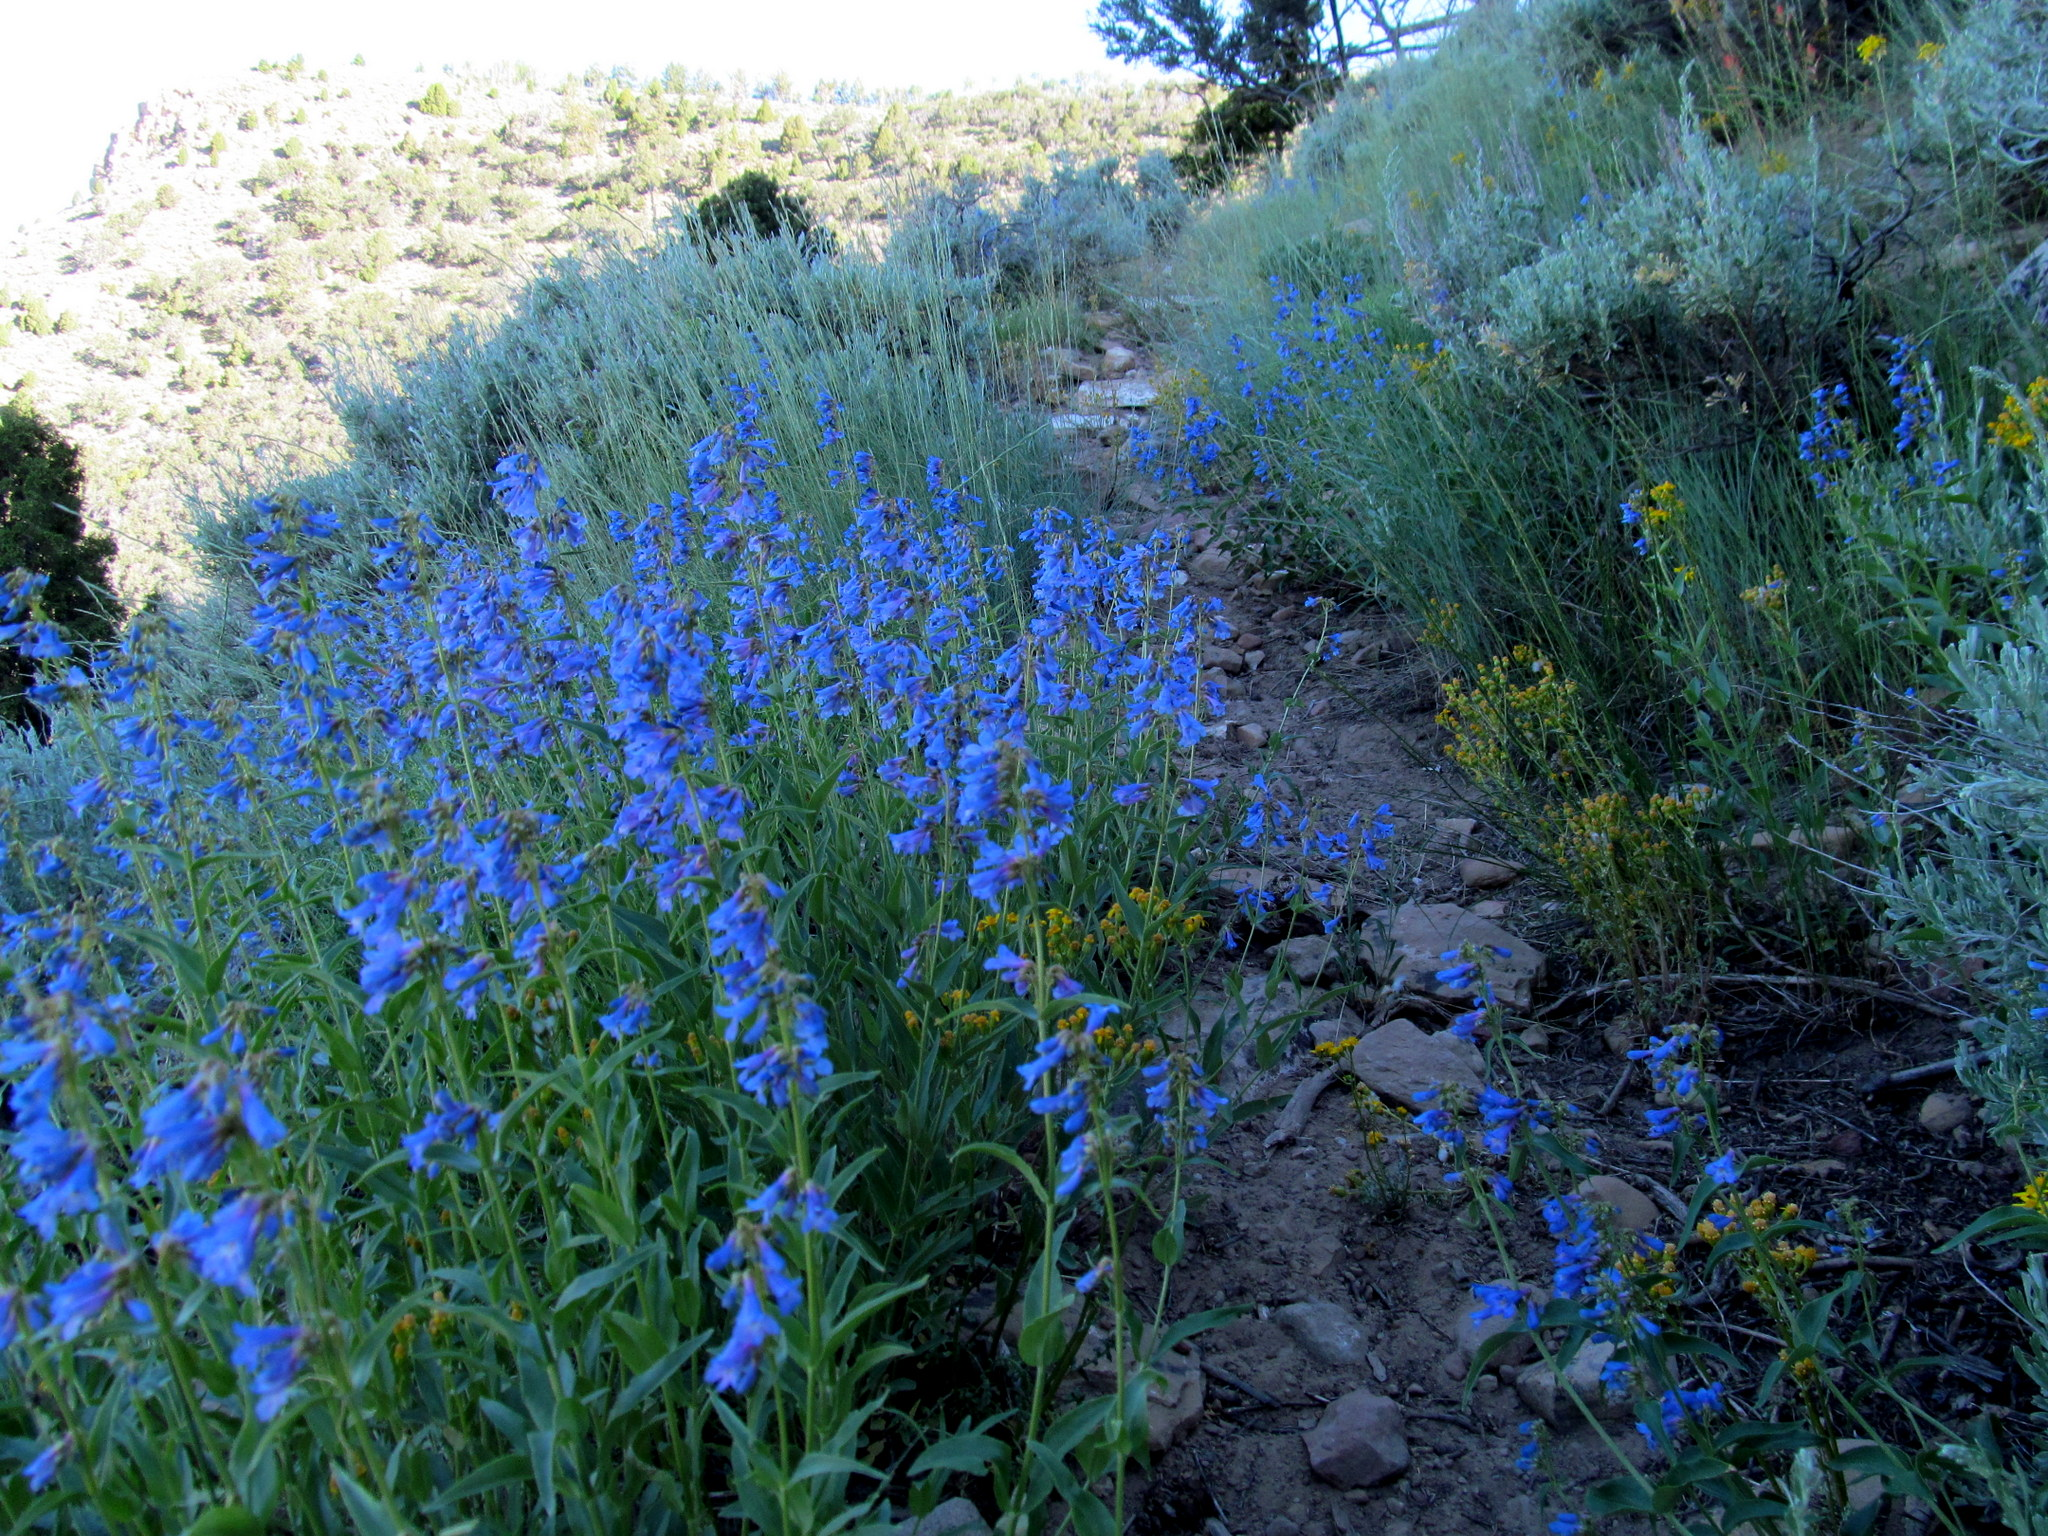 Photo: Blue-Stemmed Penstemon (Penstemon cyanocaulis)